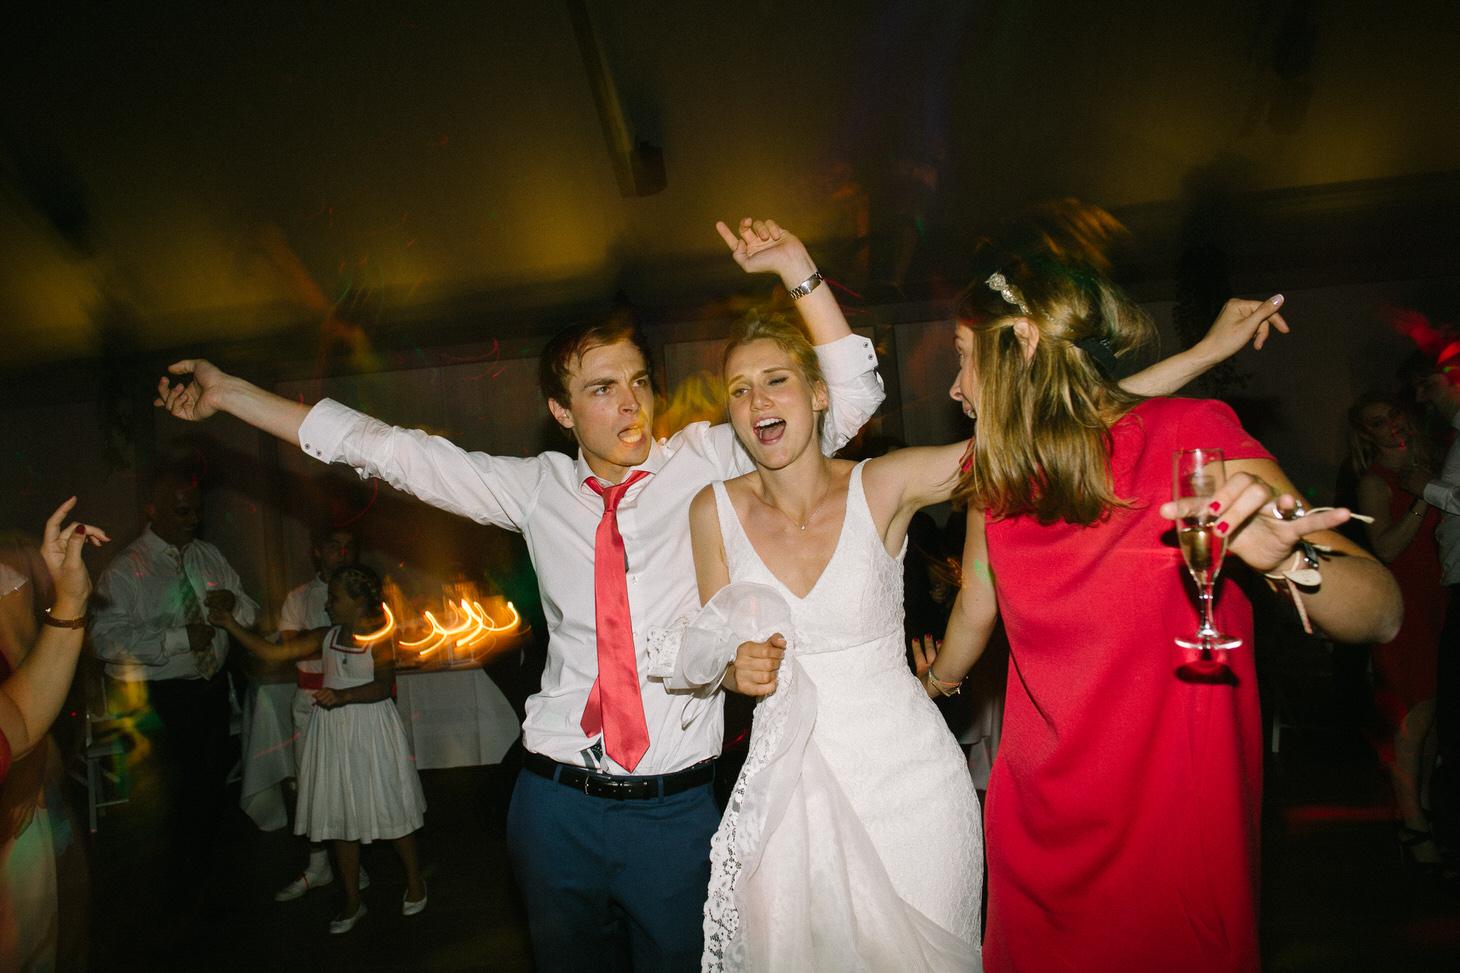 photographe-mariage-paris-montfort-l-amaury-106